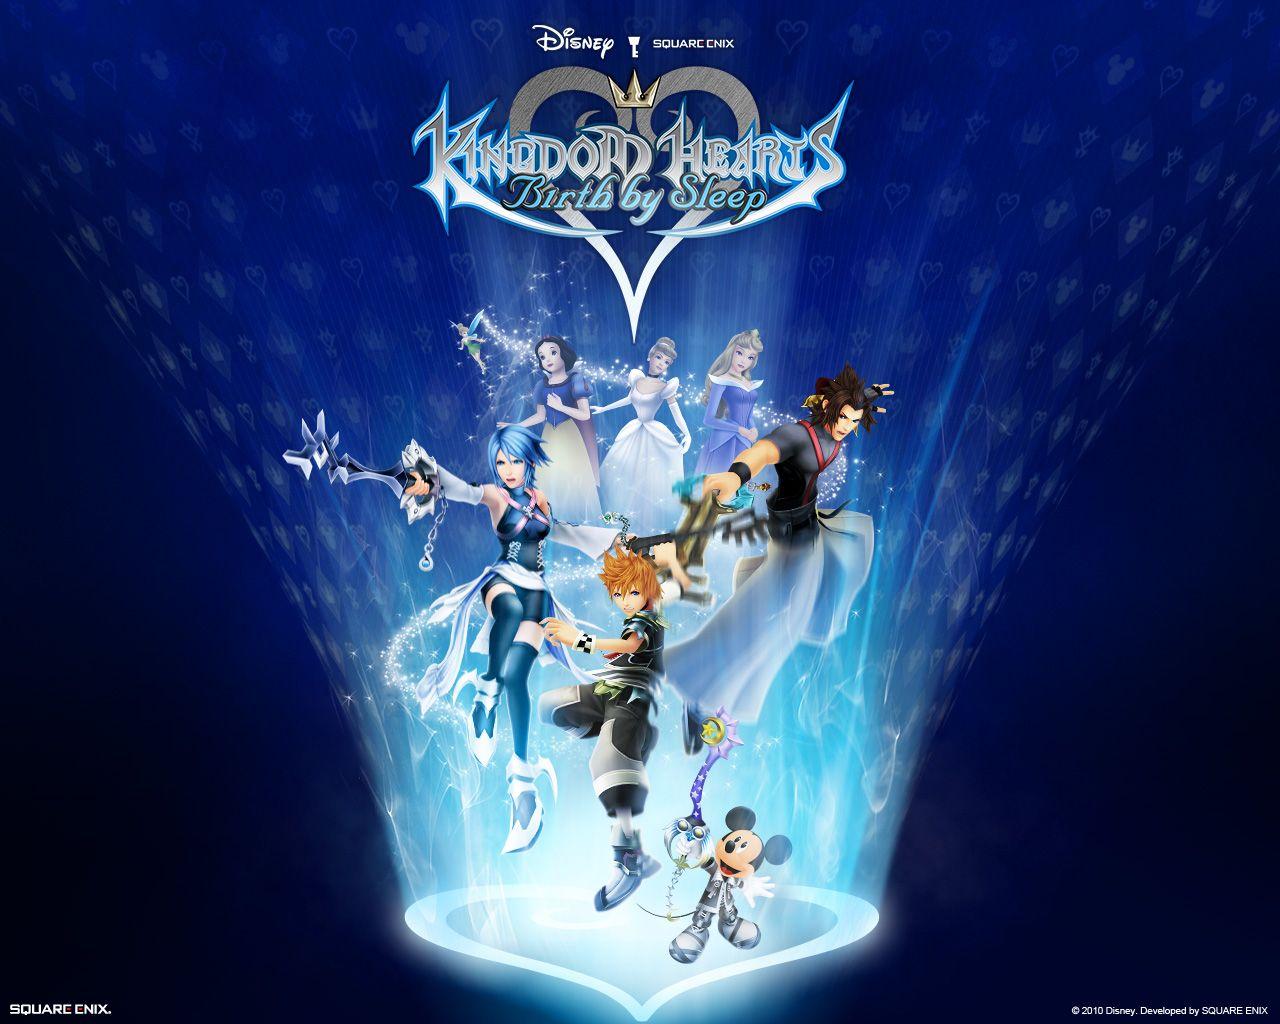 Kingdom Hearts Birth By SleepDesktop Wallpaper Downloads